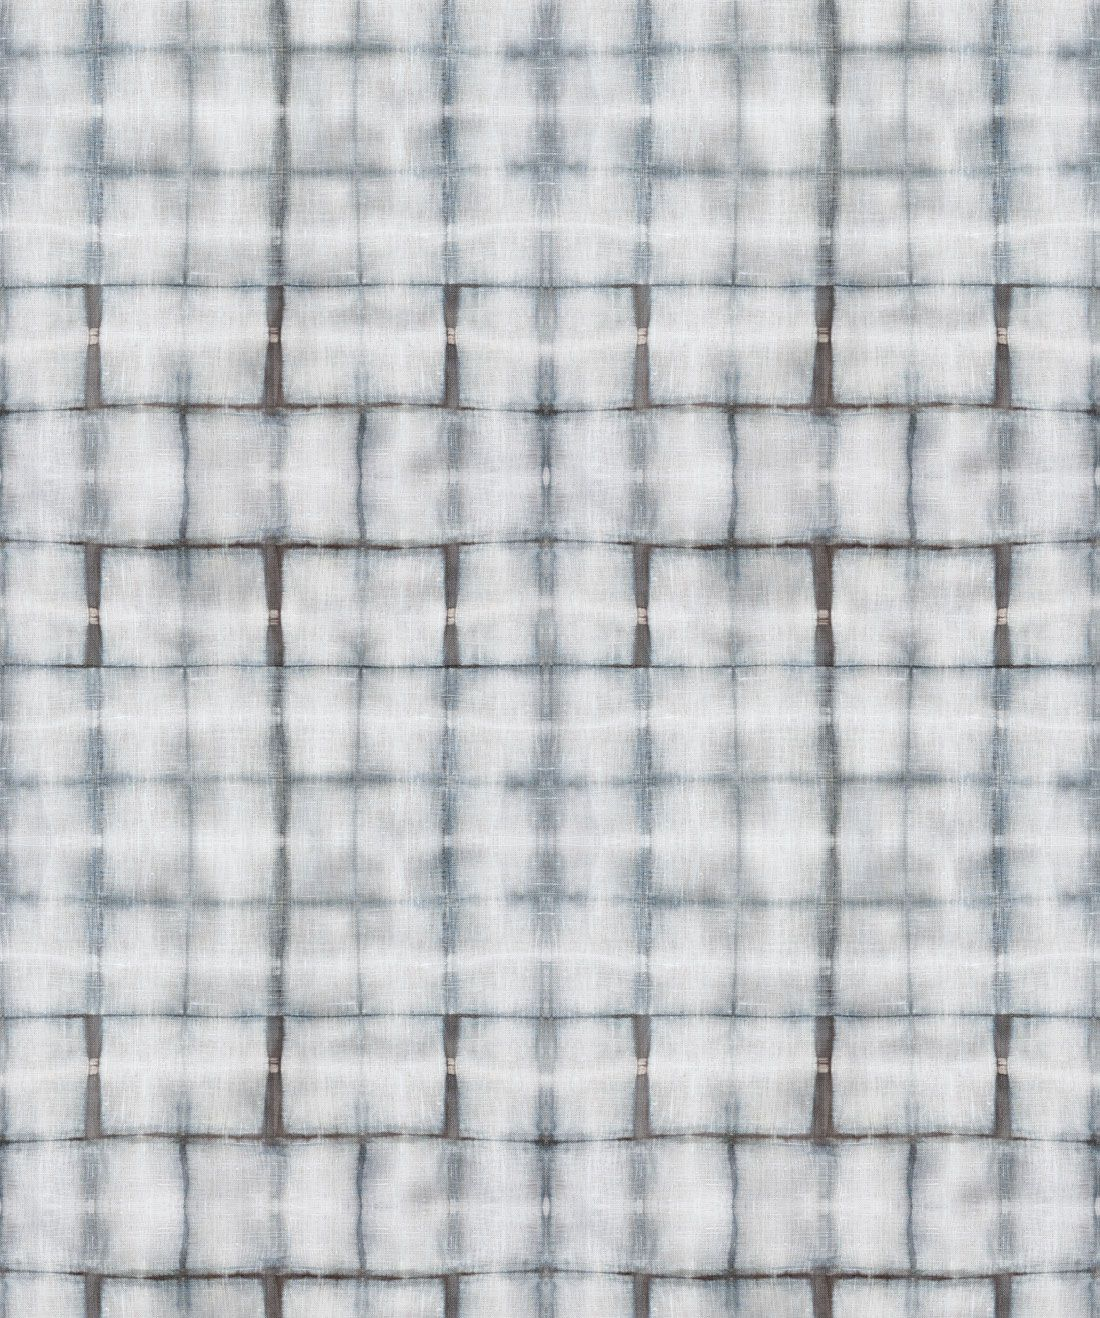 Earth Gray Brick Wallpaper